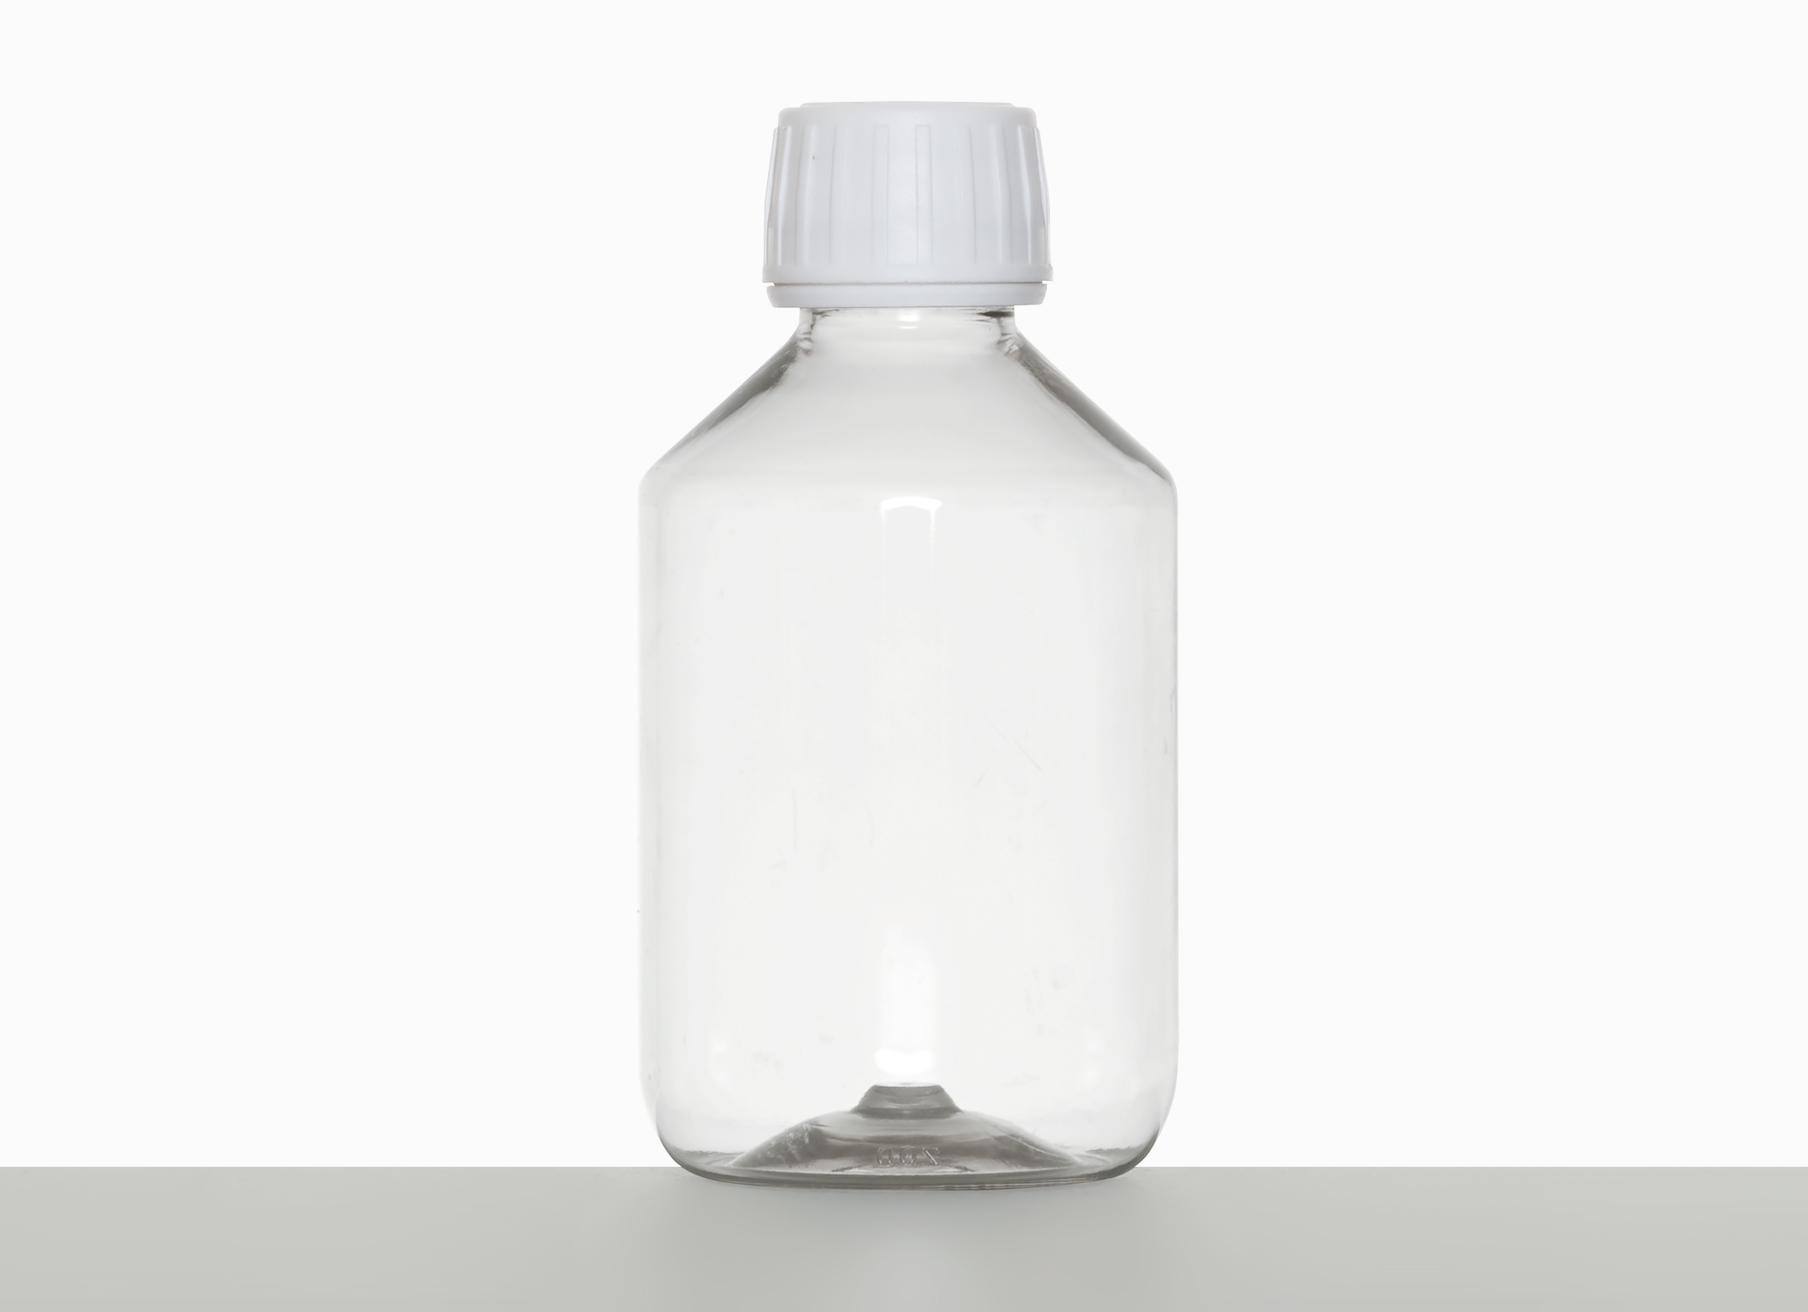 pet flasche zyl 200 ml aus pet in klar. Black Bedroom Furniture Sets. Home Design Ideas